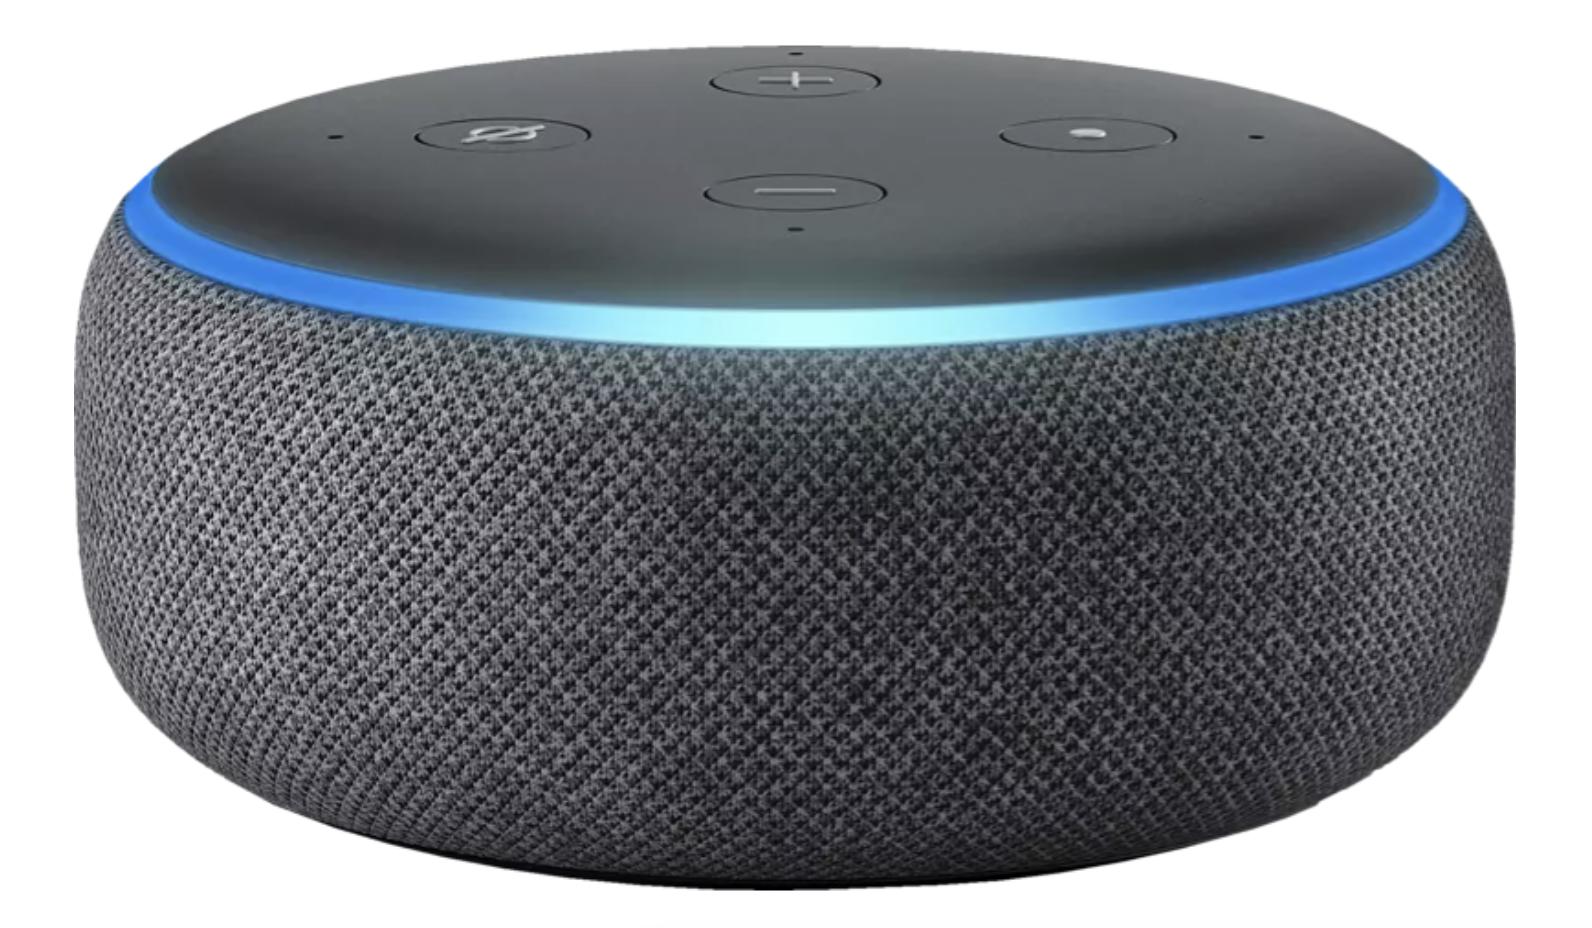 2er Philips Hue White E27 Warmweiß + Amazon Echo Dot (3. Gen) ab 26,14€